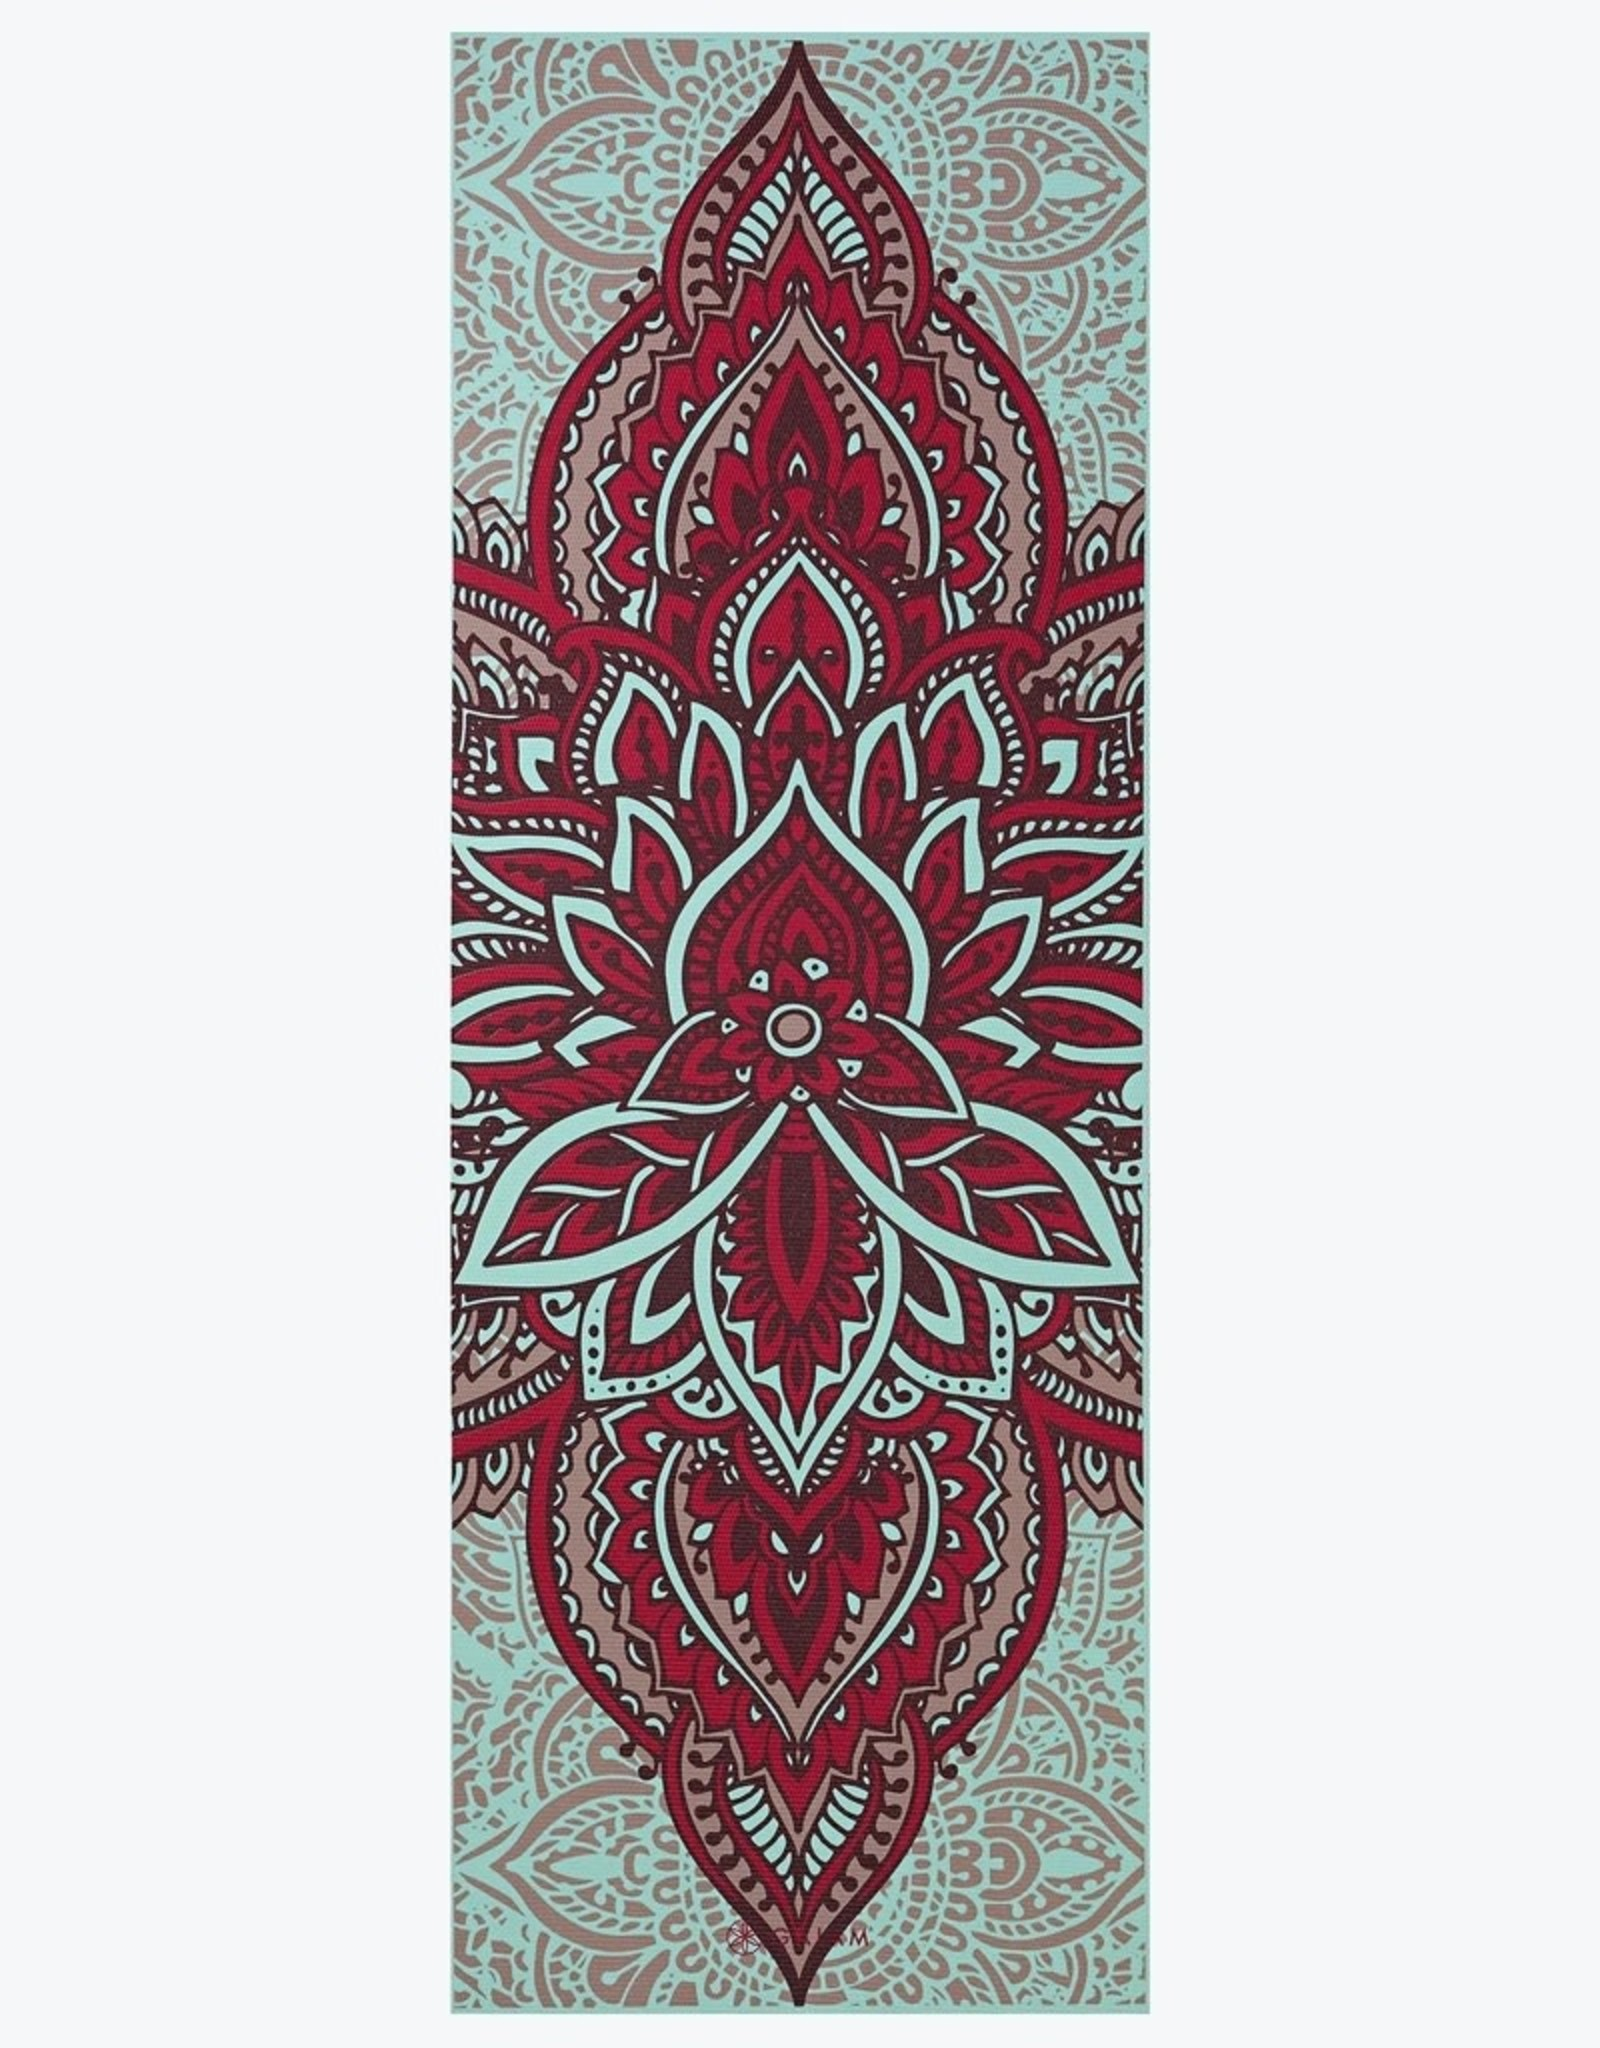 Gaiam 6mm Yoga Mat